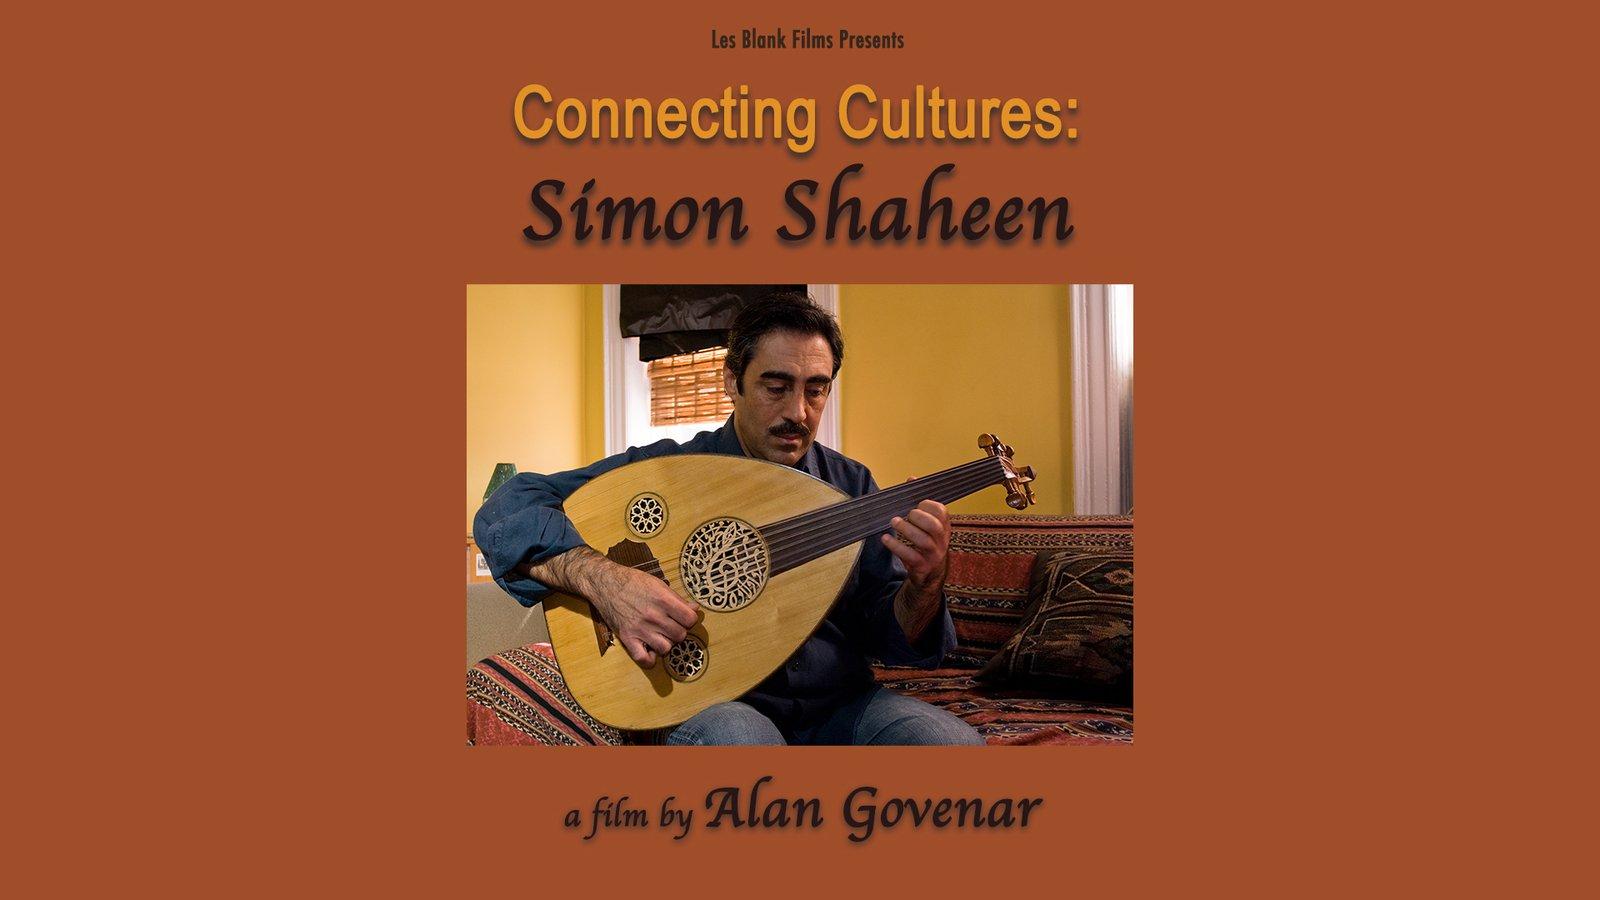 Simon Shaheen - Connecting Cultures